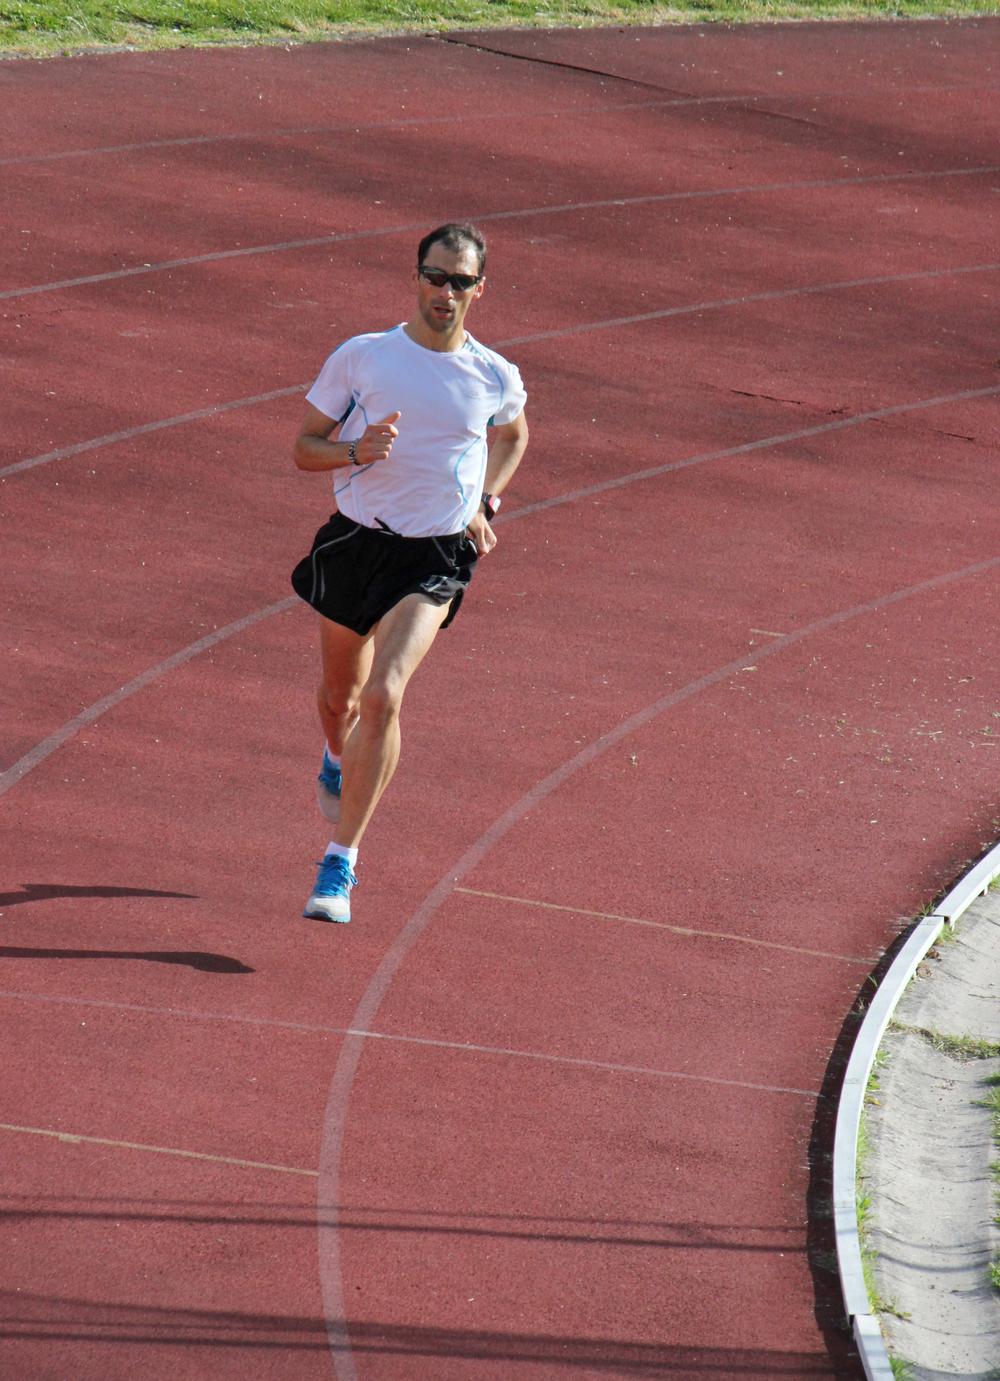 An Urbino runner training before an upcoming race.